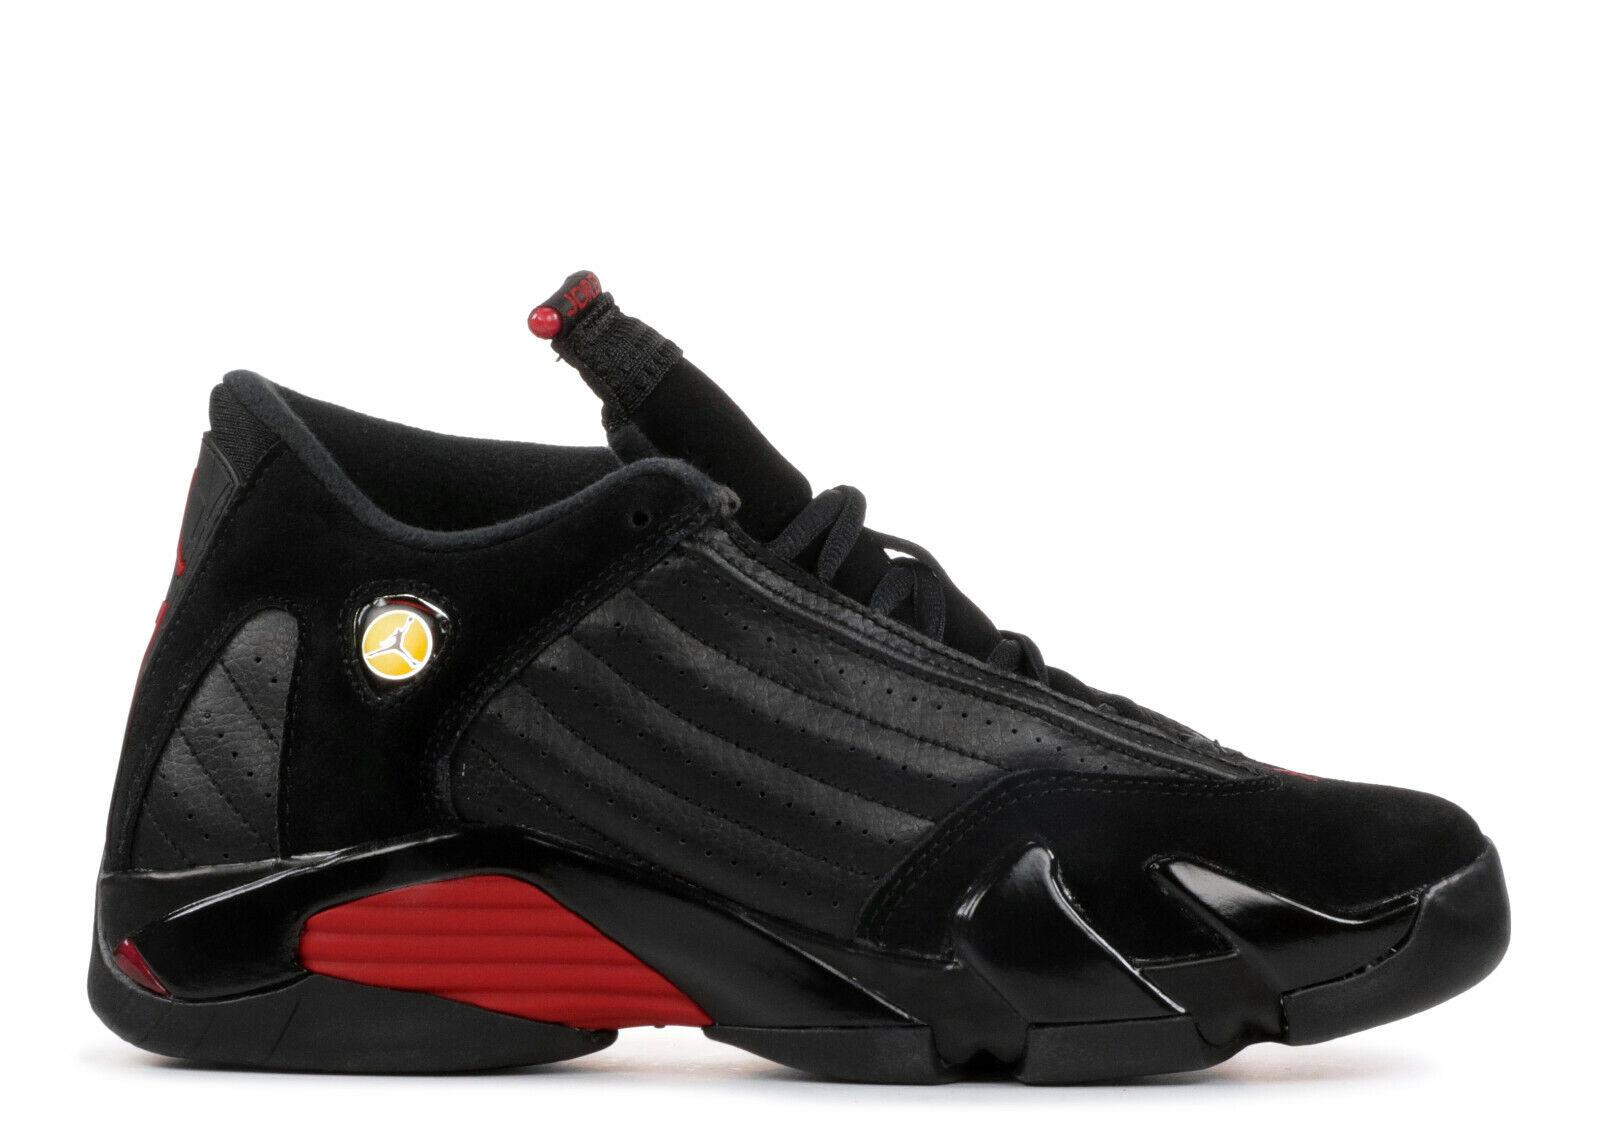 acc9f8f88223 Boys Air Jordan 14 Retro BG 487524-003 Black varsity Red Size 3.5y ...